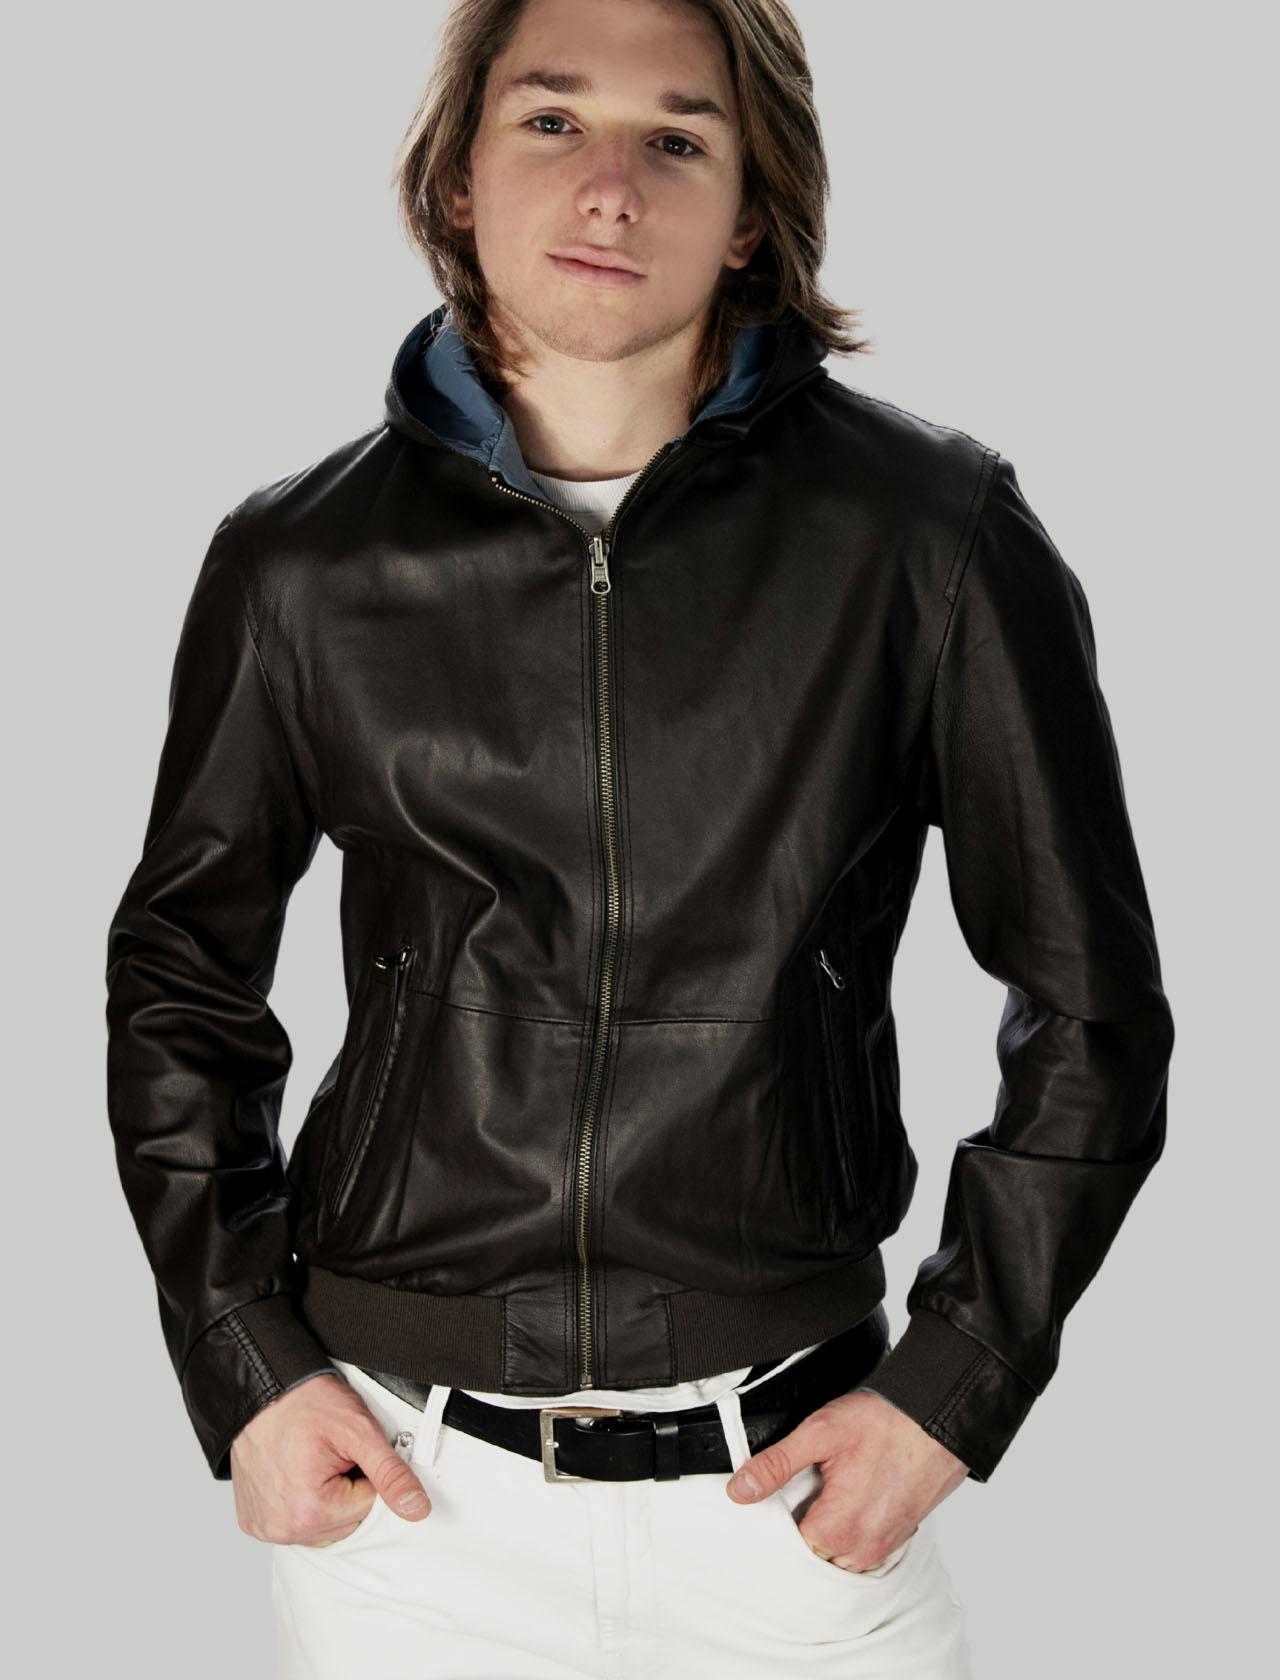 Men's Clothing Dark Brown Reversible Leather Jacket with Hood Minoronzoni | Jackets | MRS215J207013